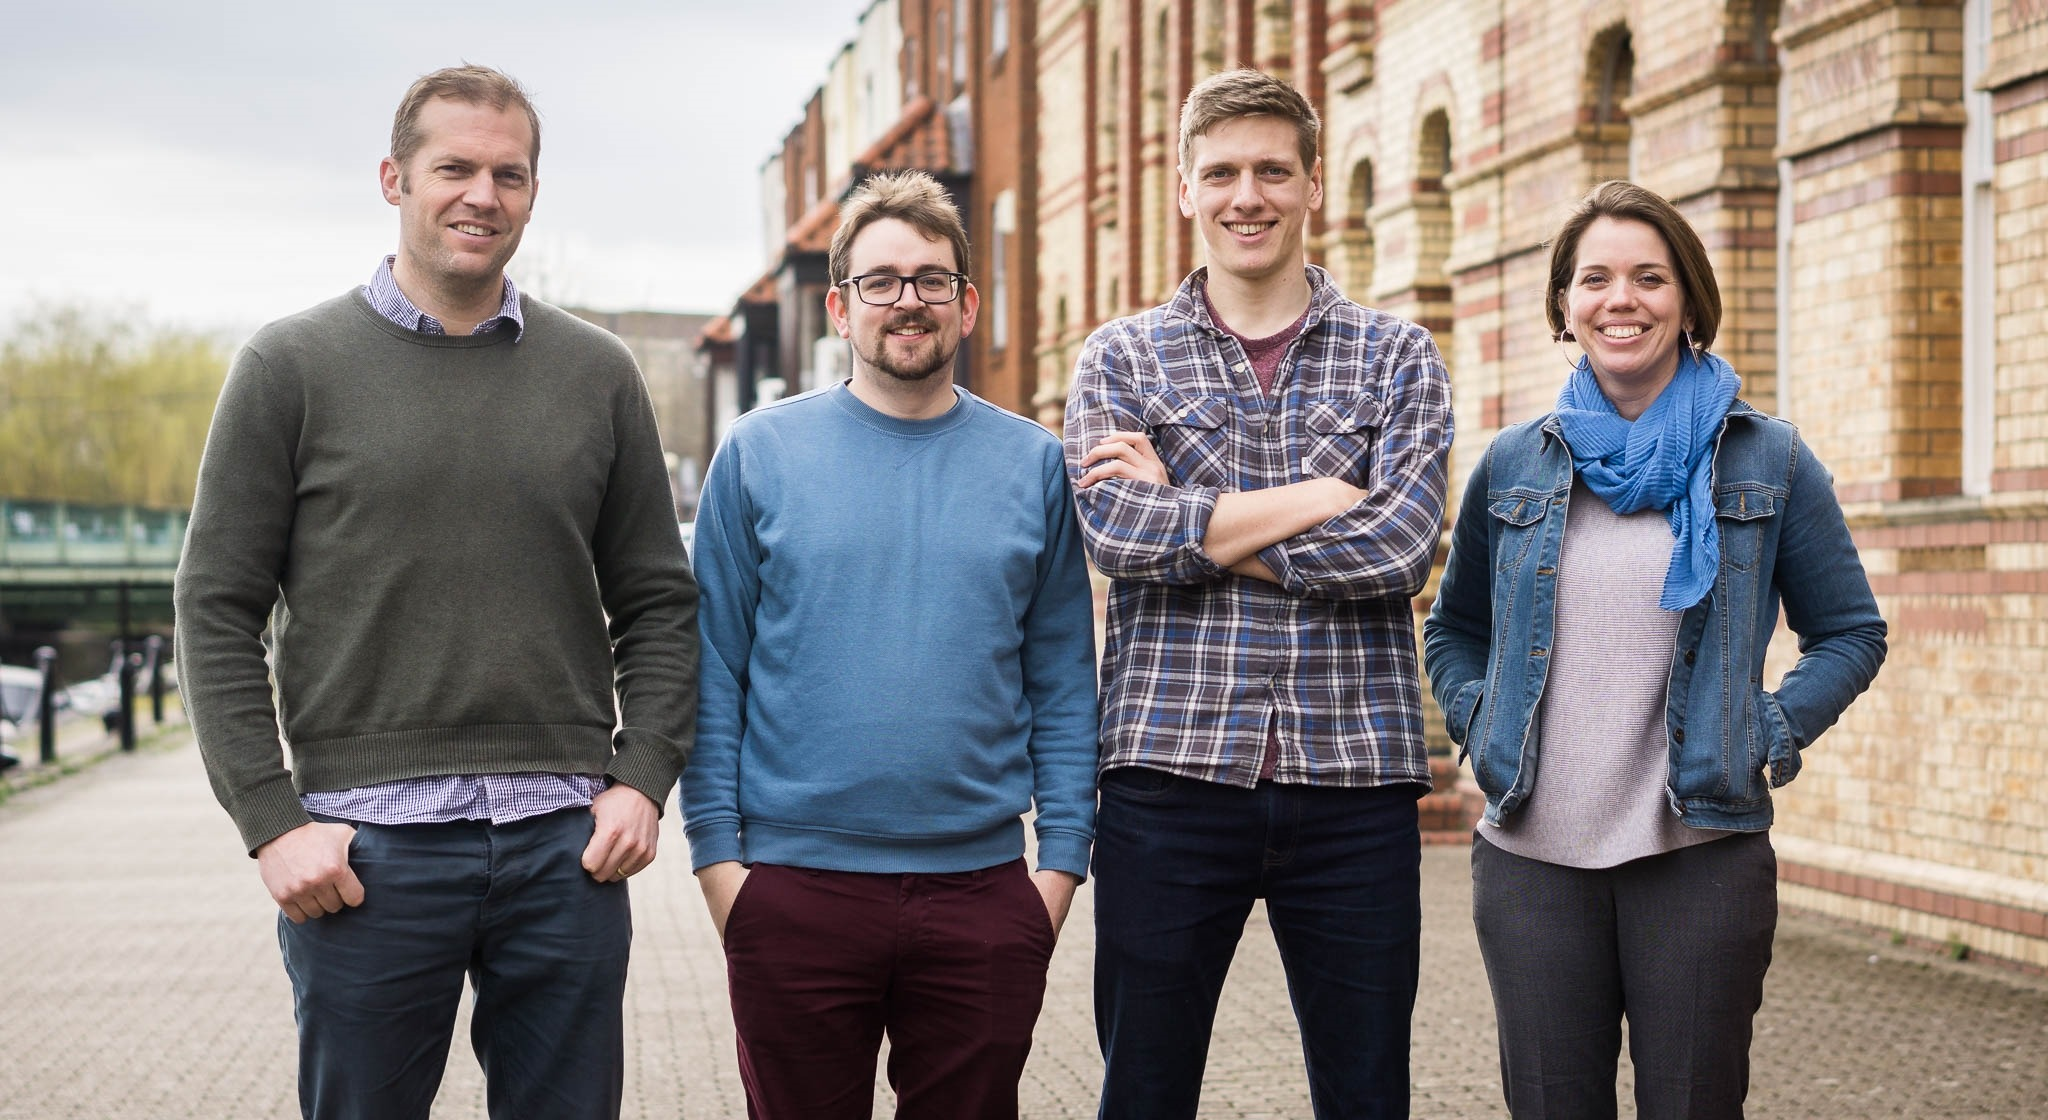 Tenacious Bristol startup triumph over adversity